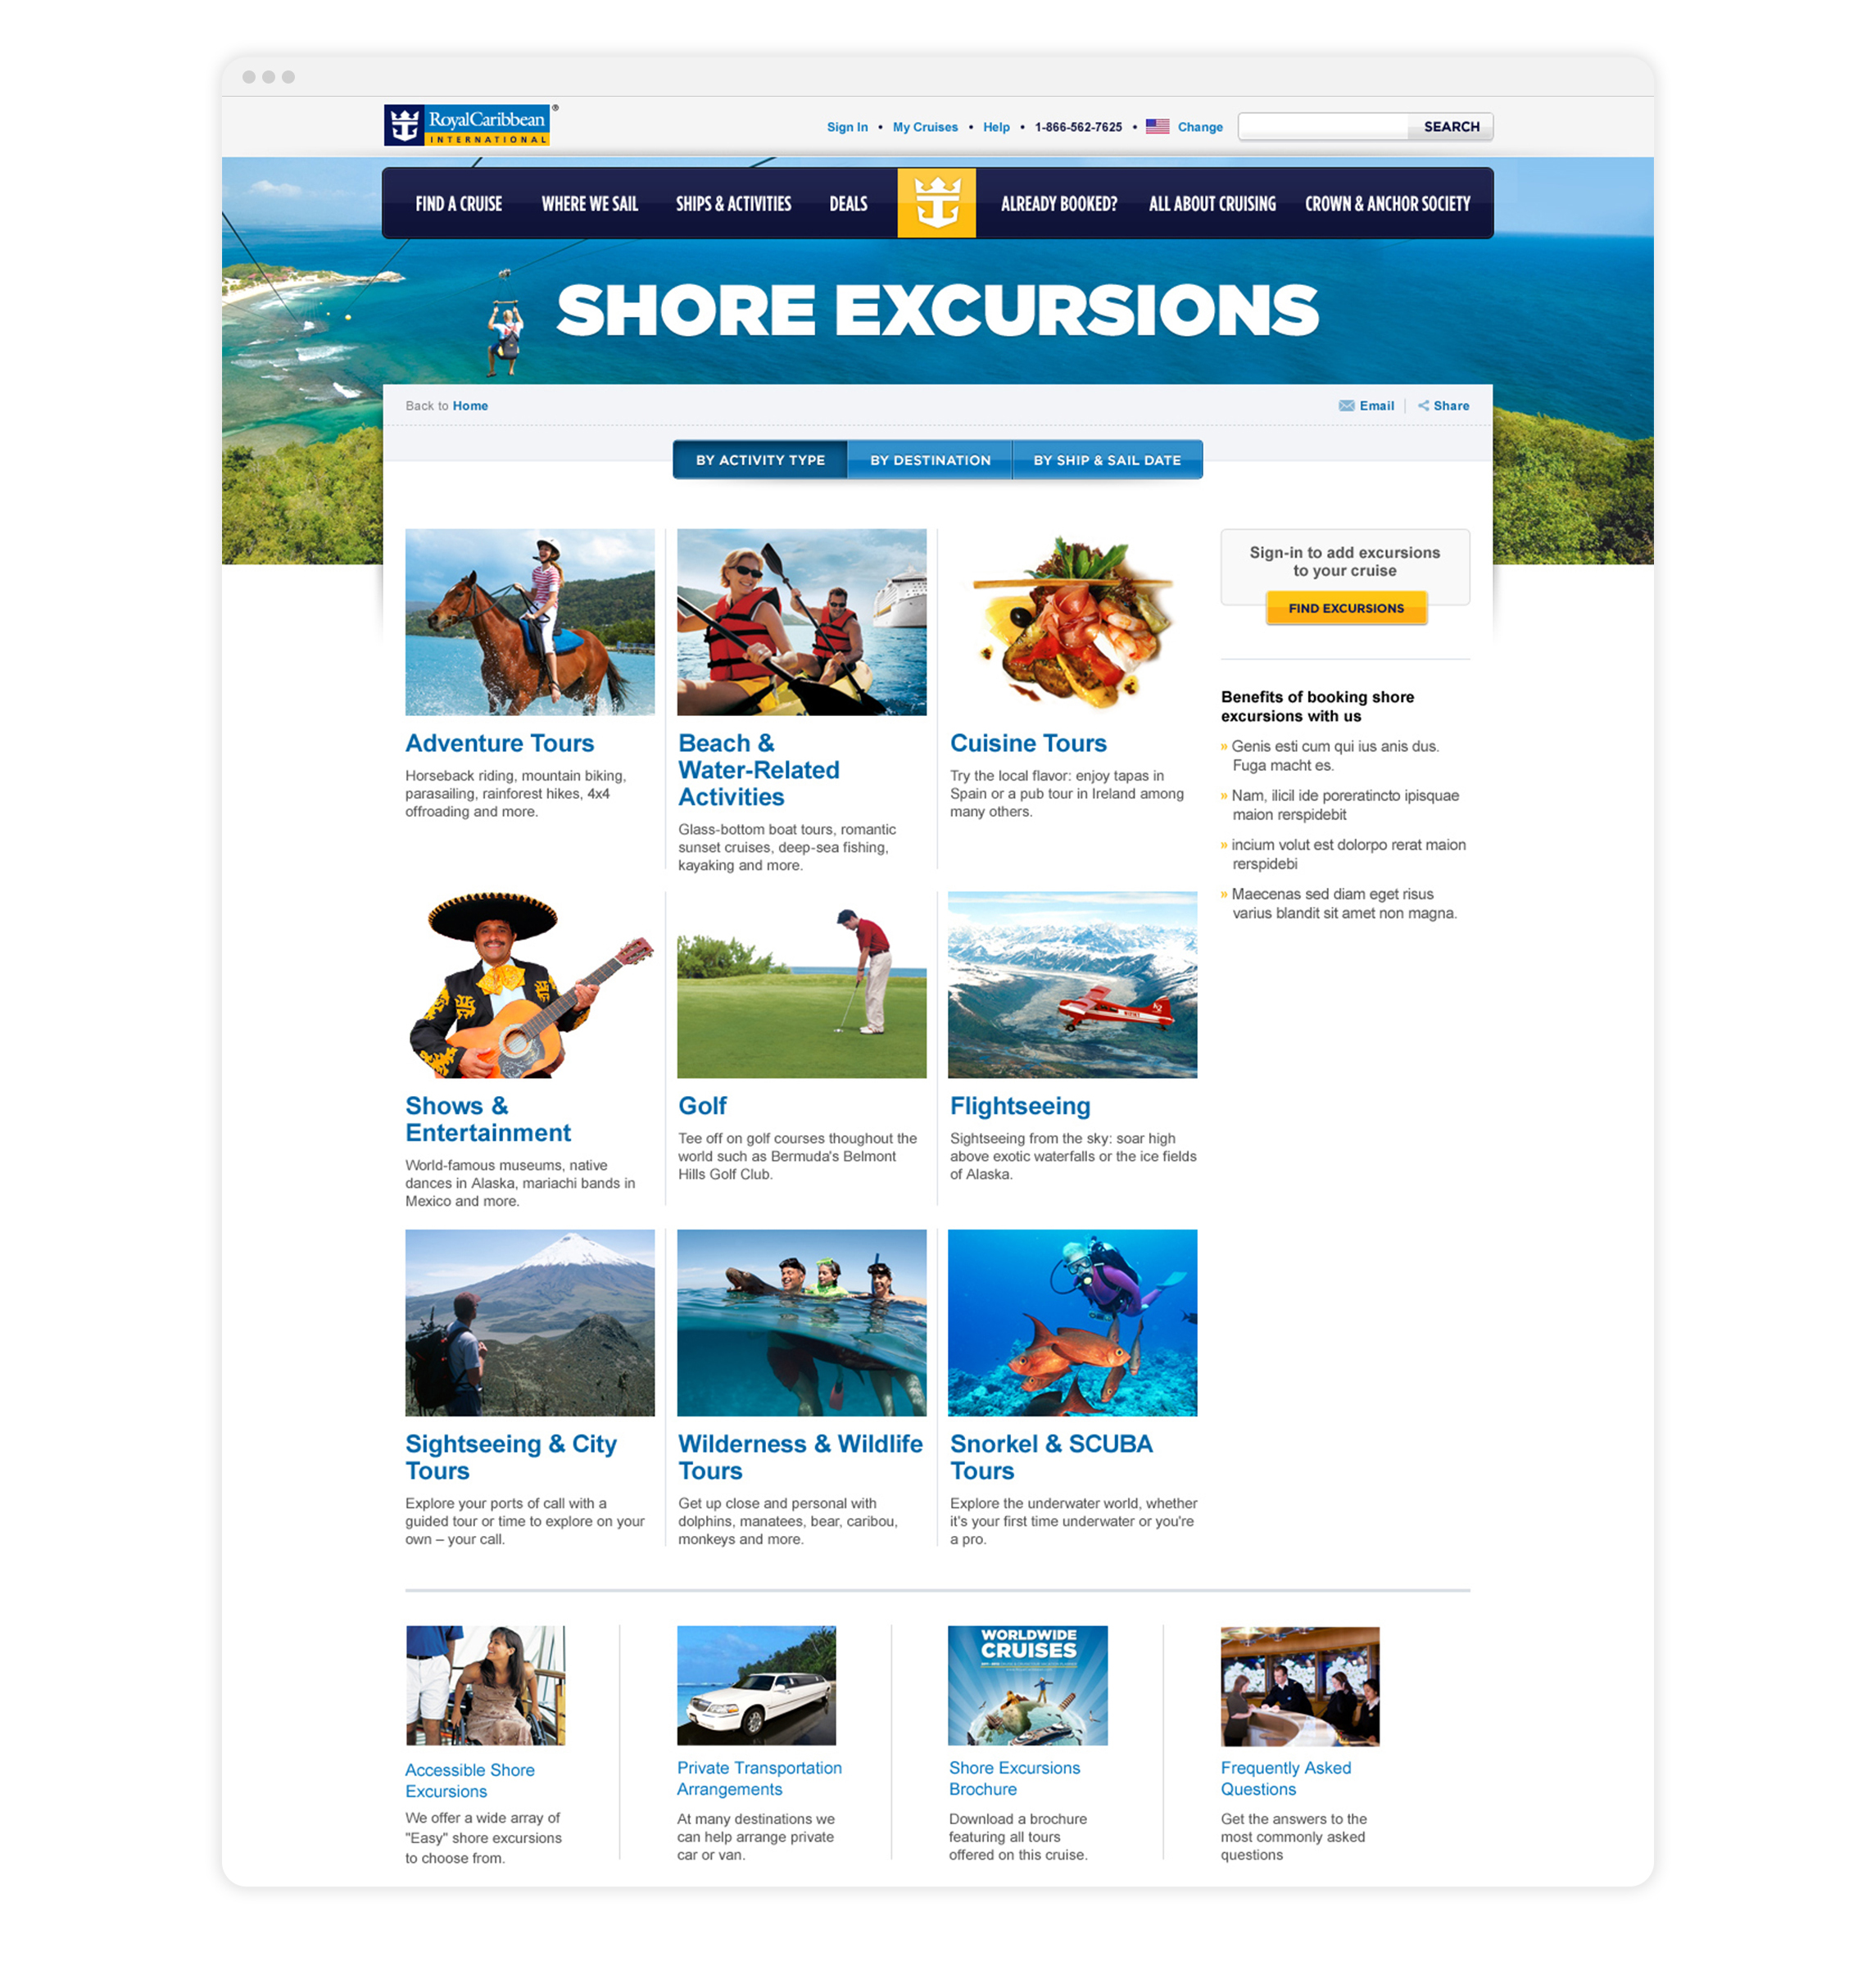 03-royal-caribbean-international-shore-excursions.jpg